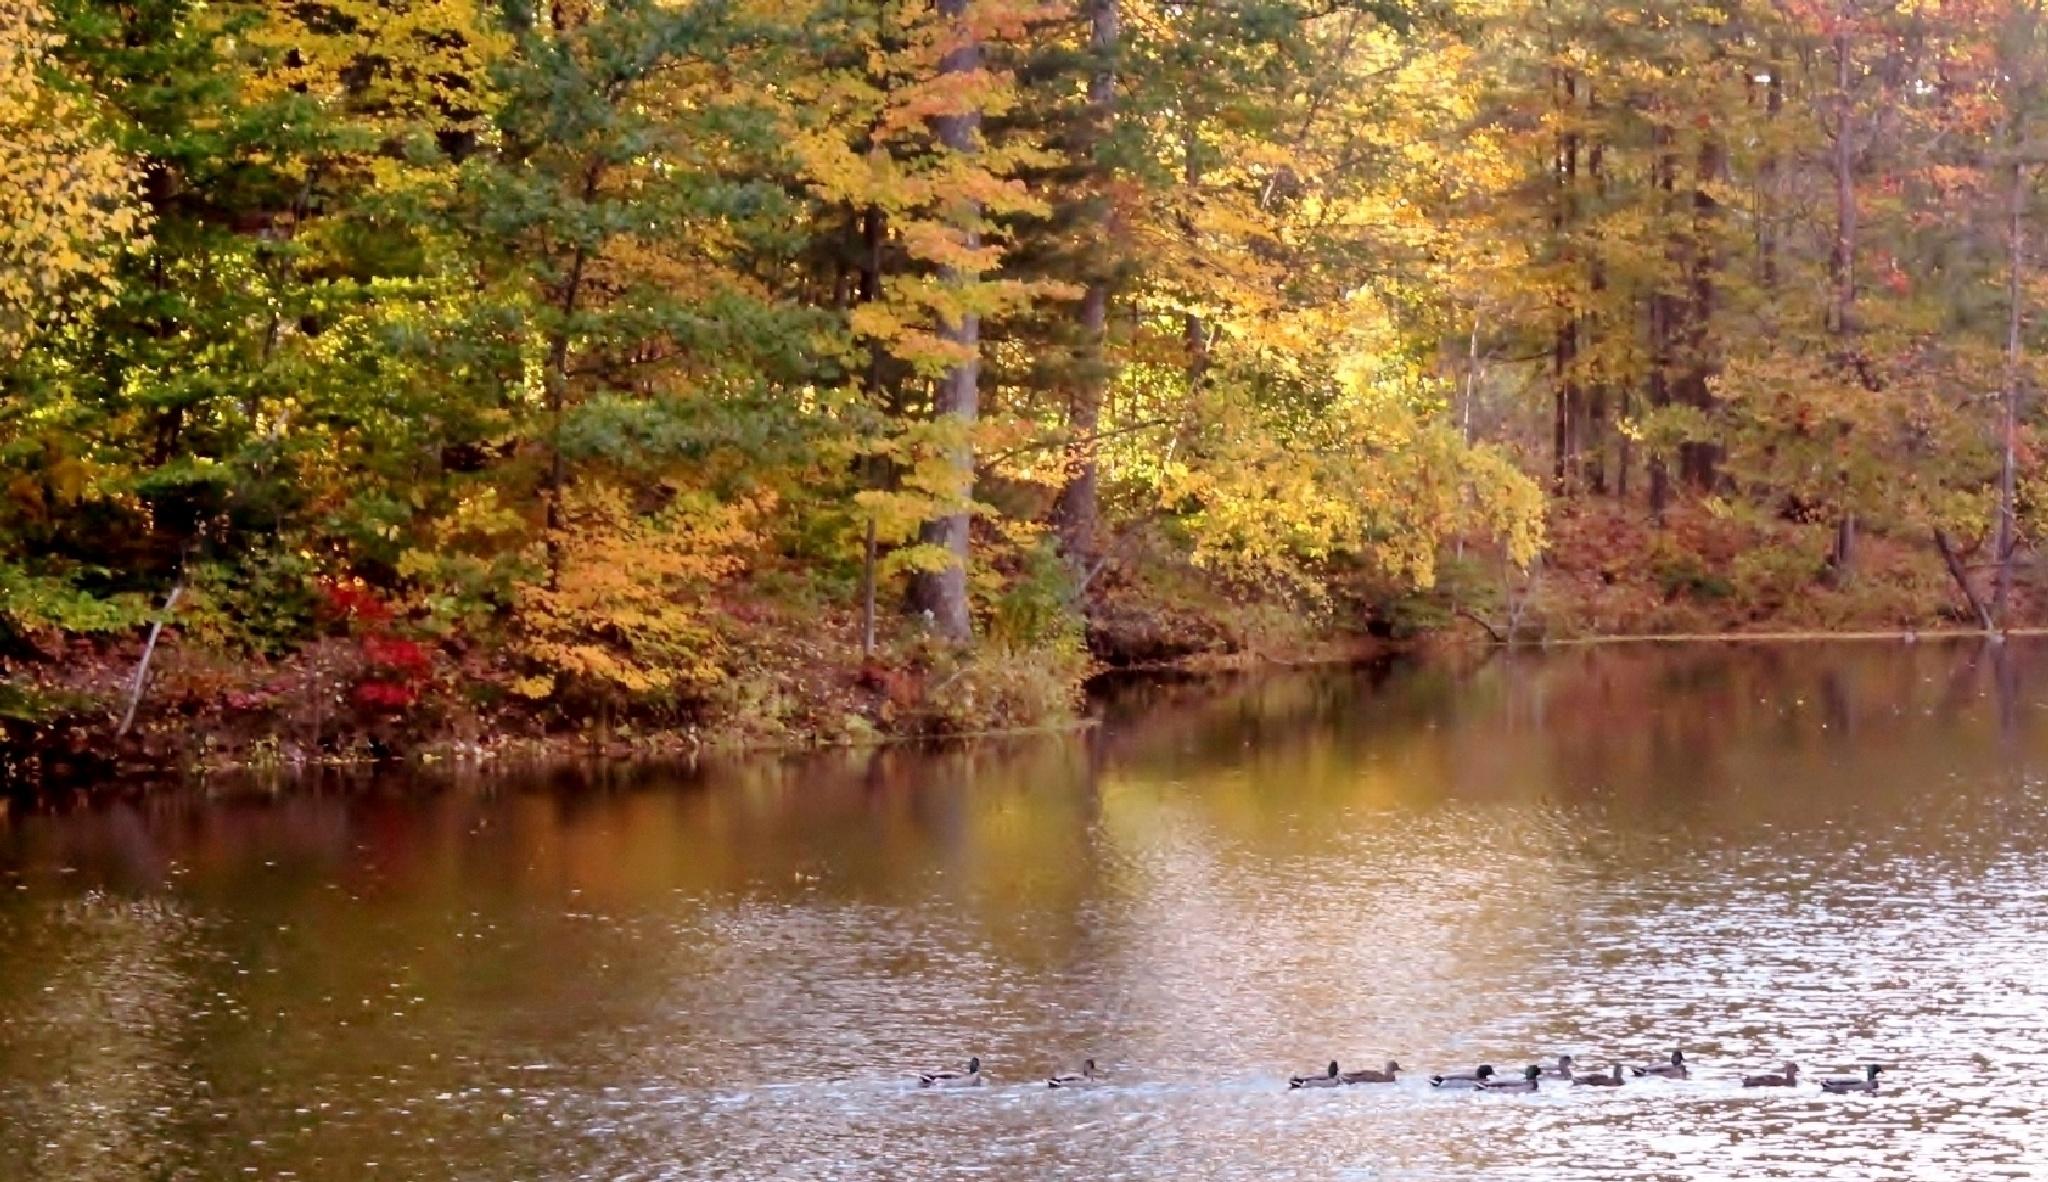 Ducks Enjoying the Pond~ by debbie.lamontesnyder